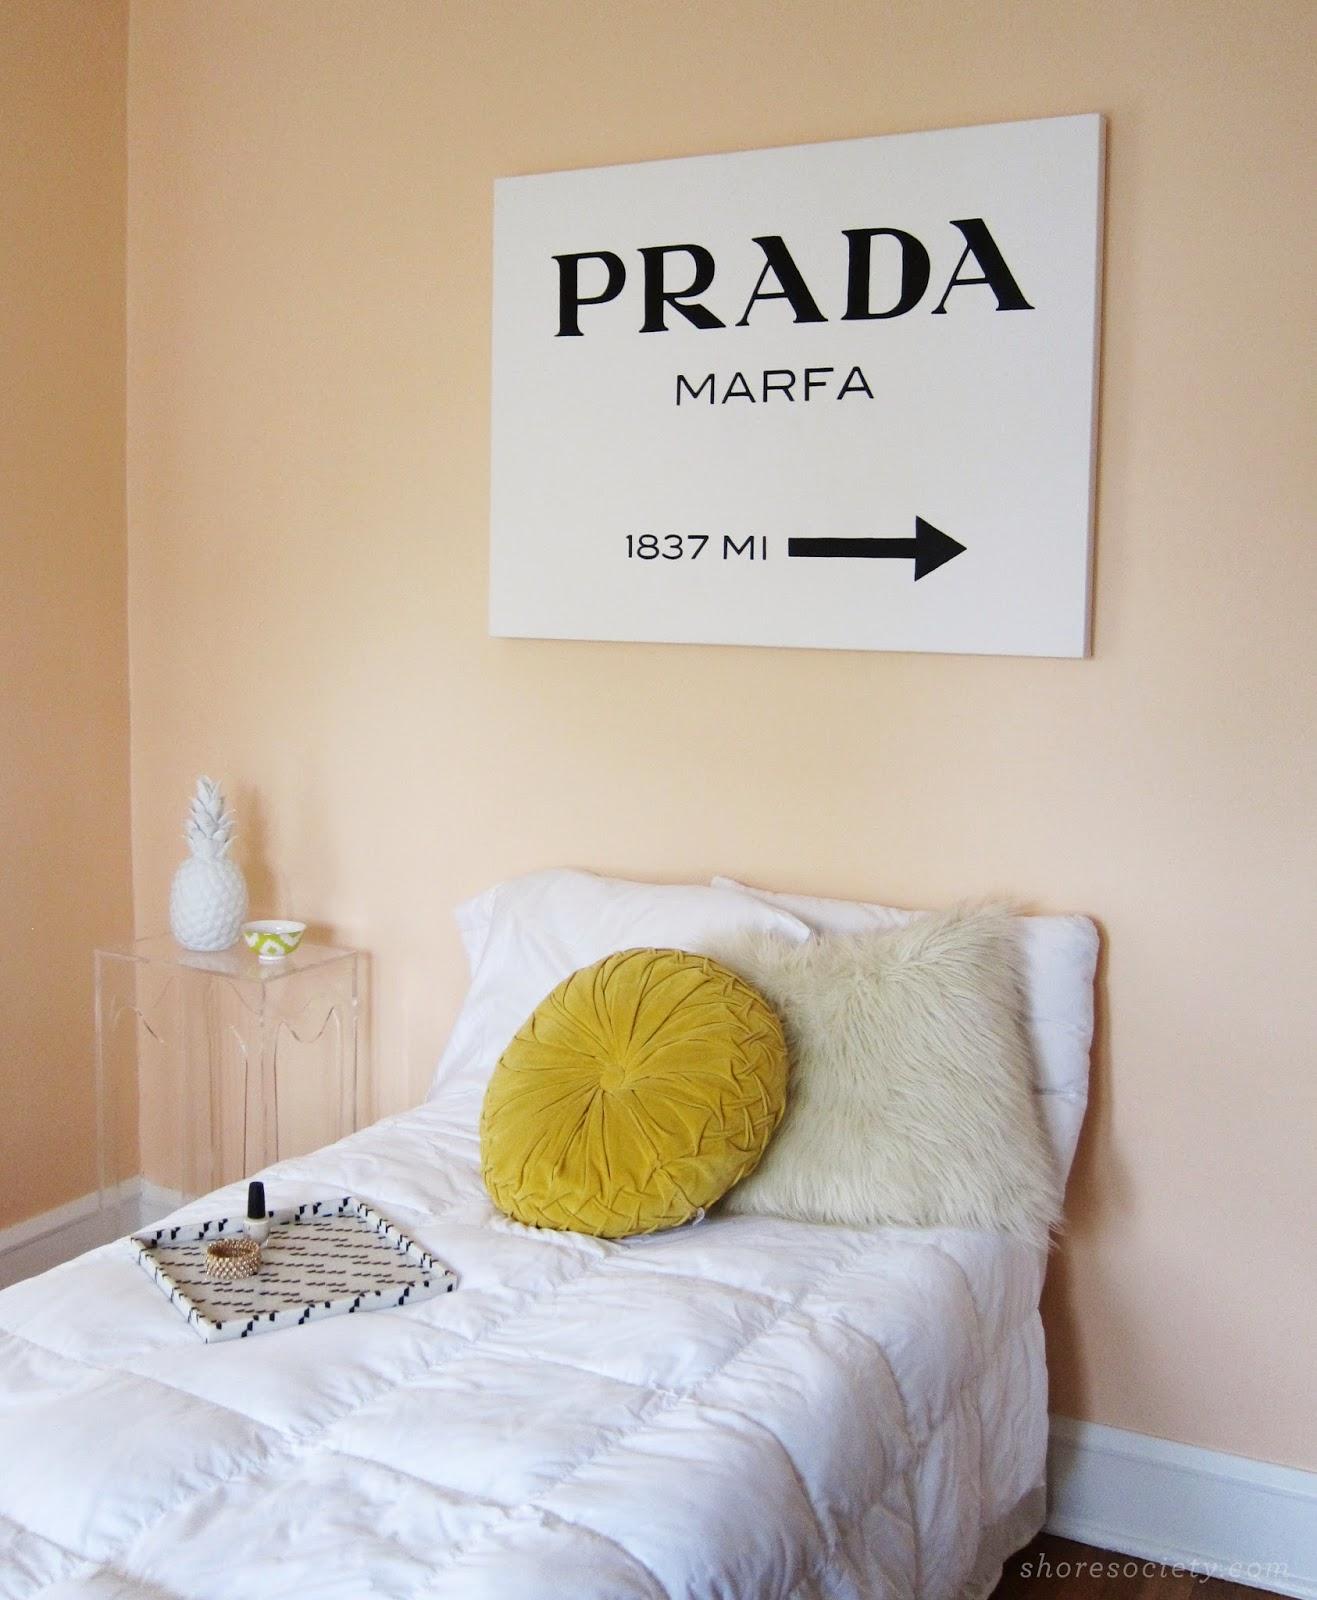 Prada_Marfa_DIY_1